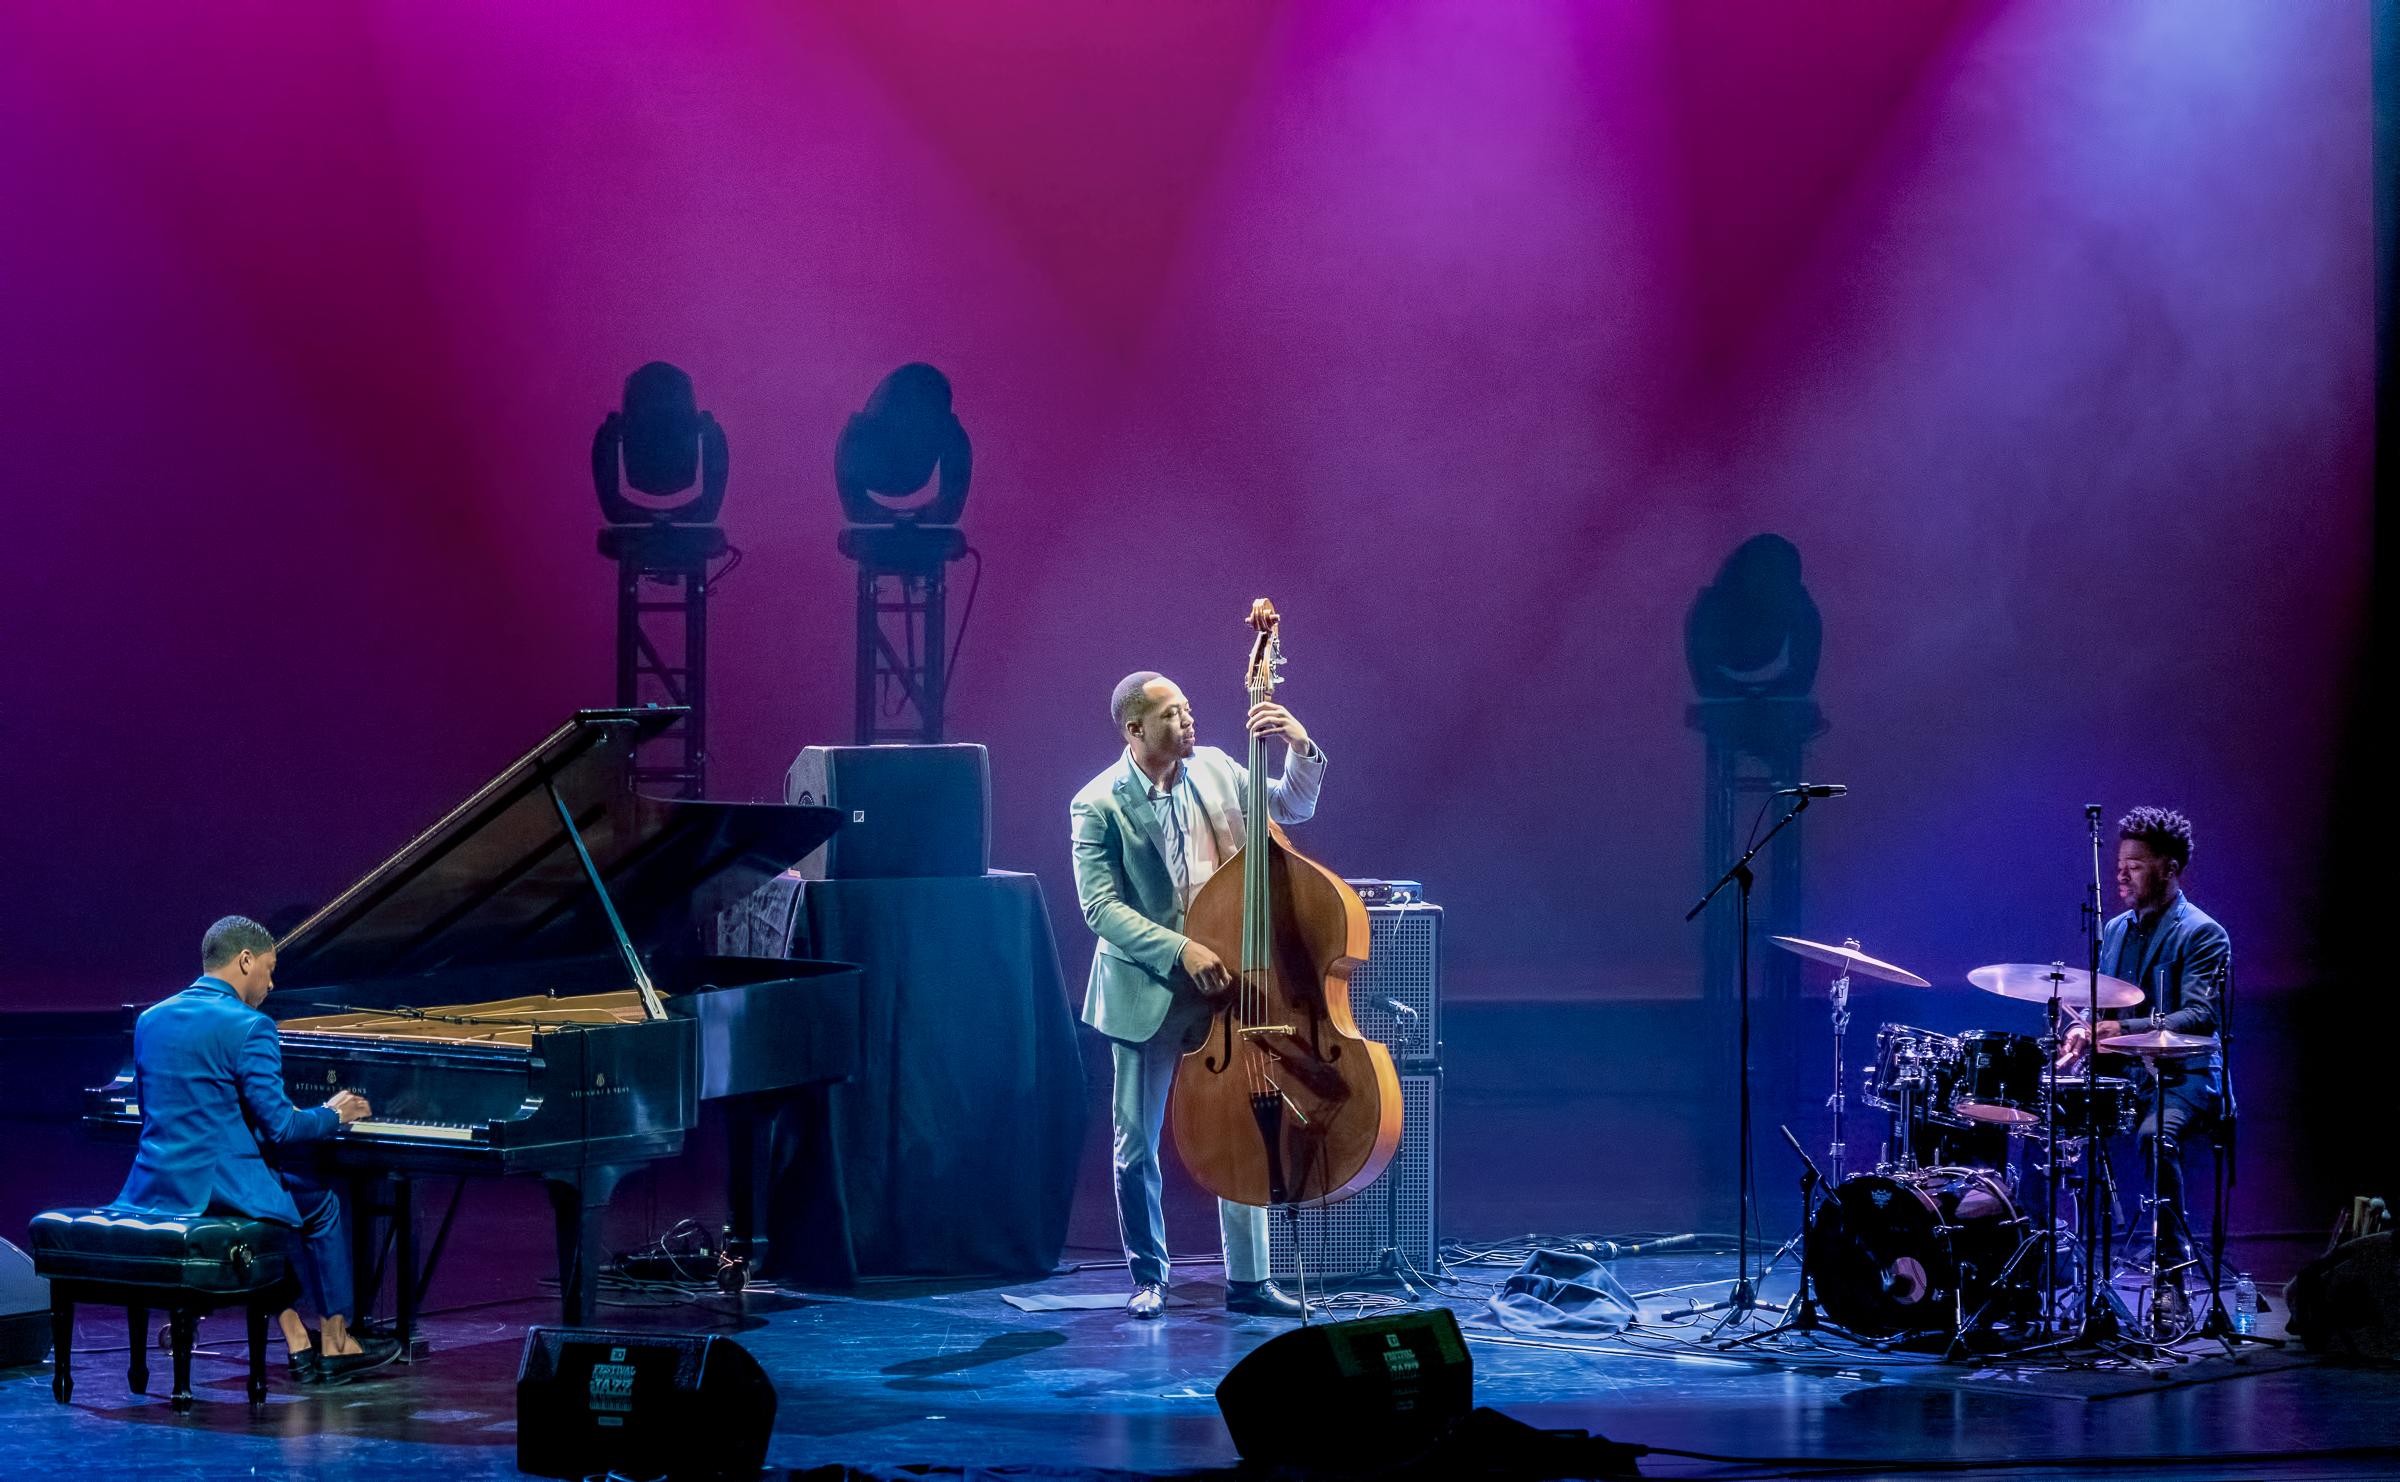 Christian Sands, Eric Wheeler and Jonathan Barber at The Montreal International Jazz Festival 2018